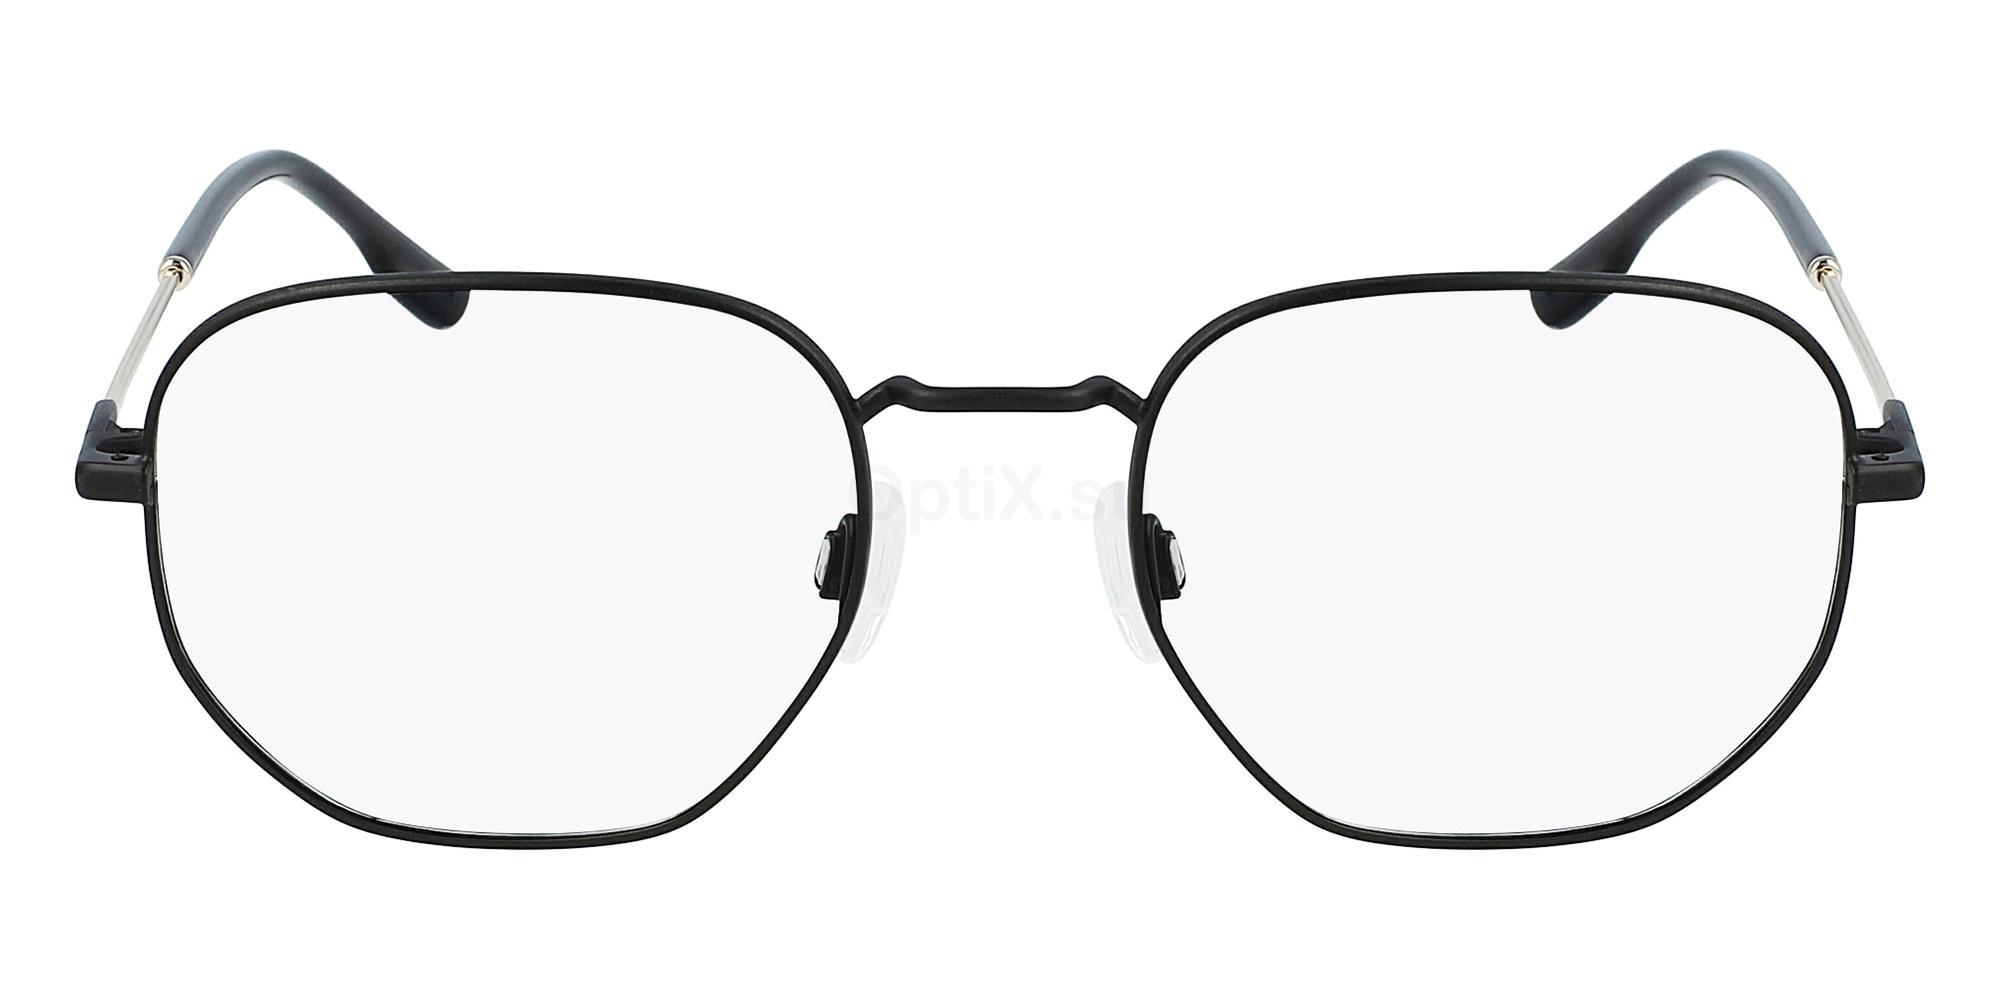 001 SK2119 FANTASTISK Glasses, Skaga